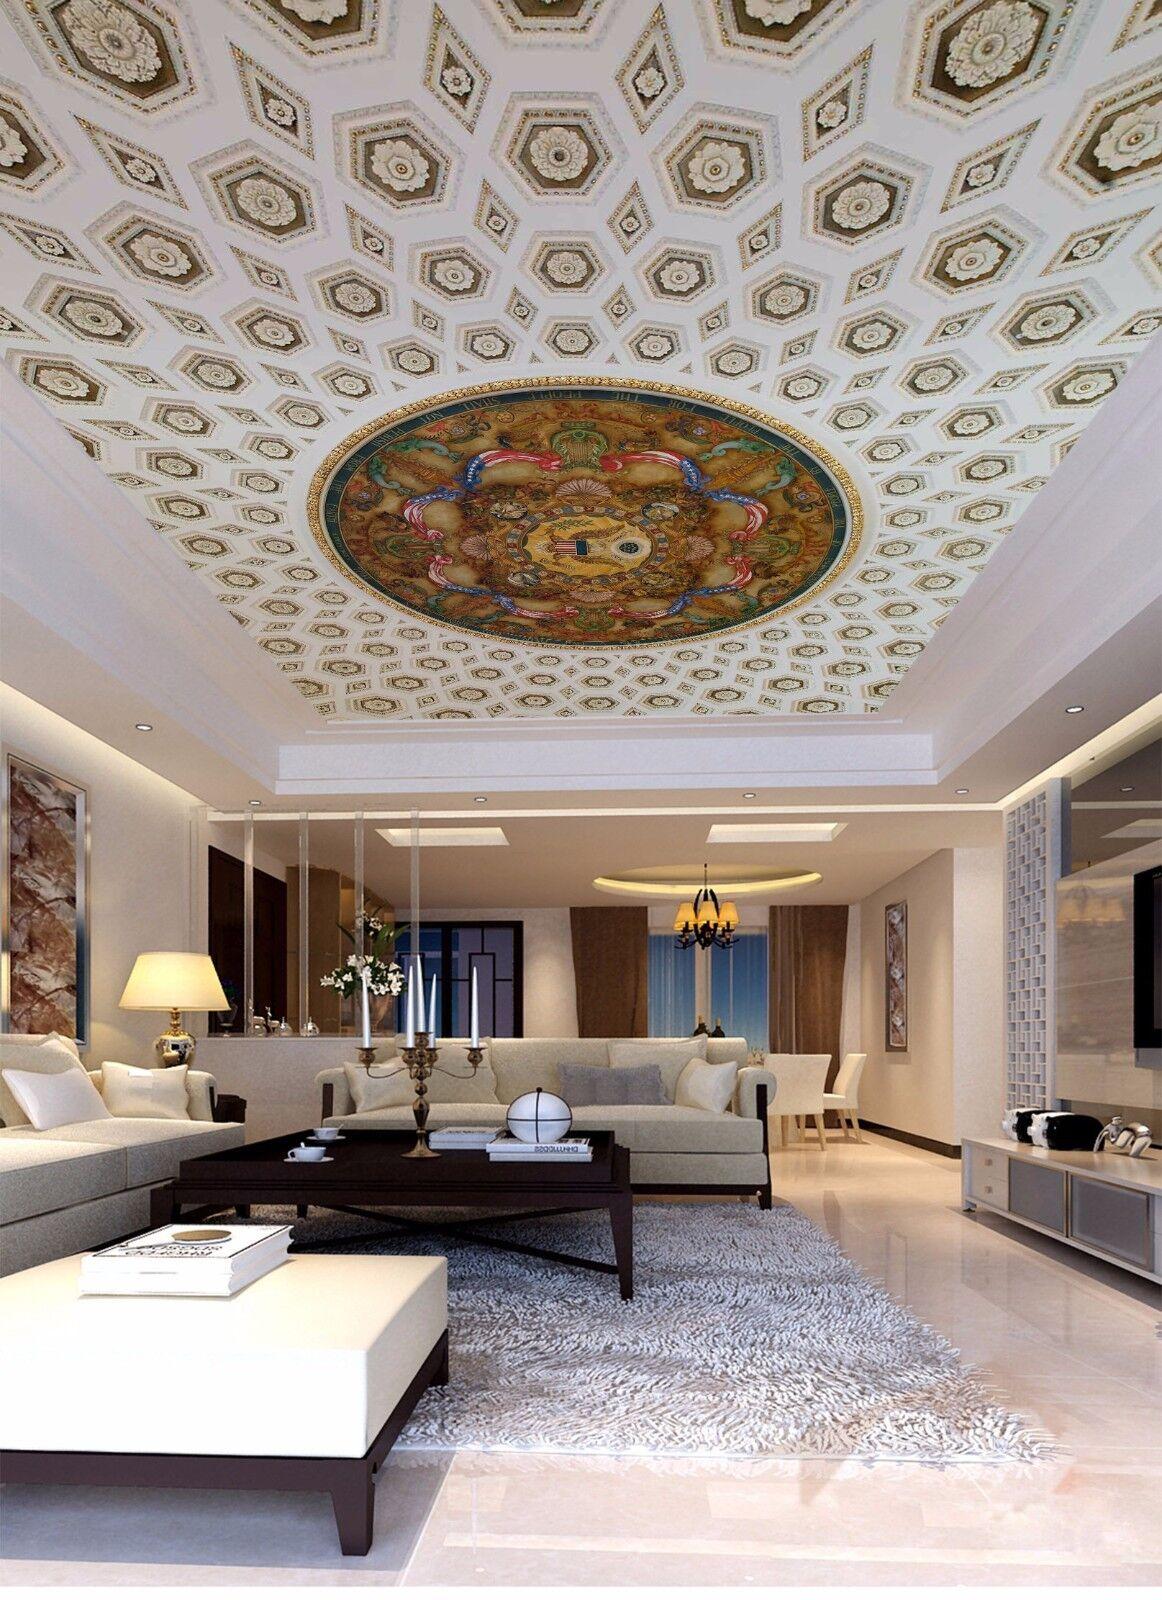 3D Art Painting 5 Ceiling WallPaper Murals Wall Print Decal Deco AJ WALLPAPER UK